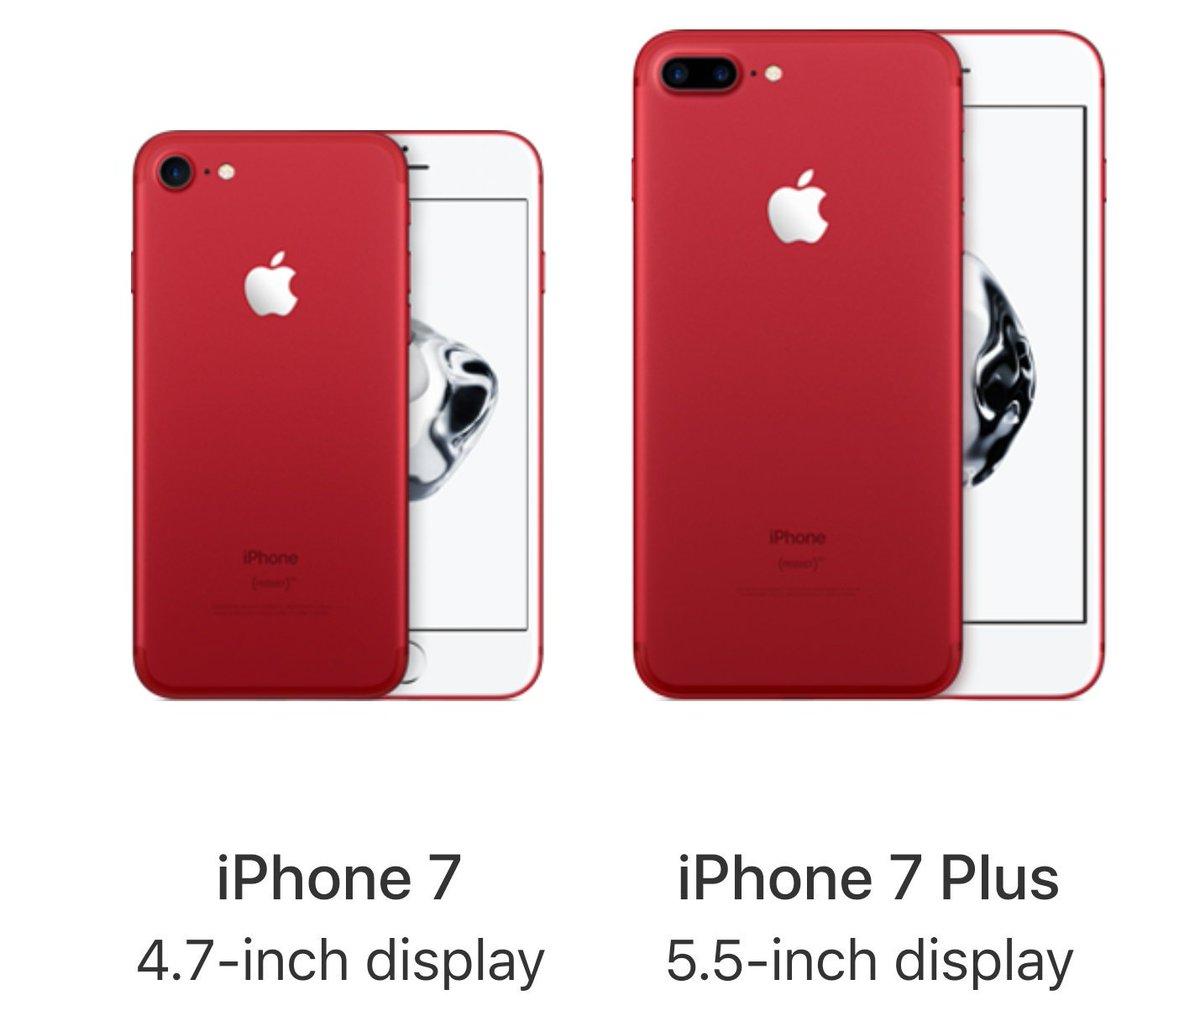 Nuovo iPhone 7 e iPhone 7 Plus: Rossa sorpresa di Apple